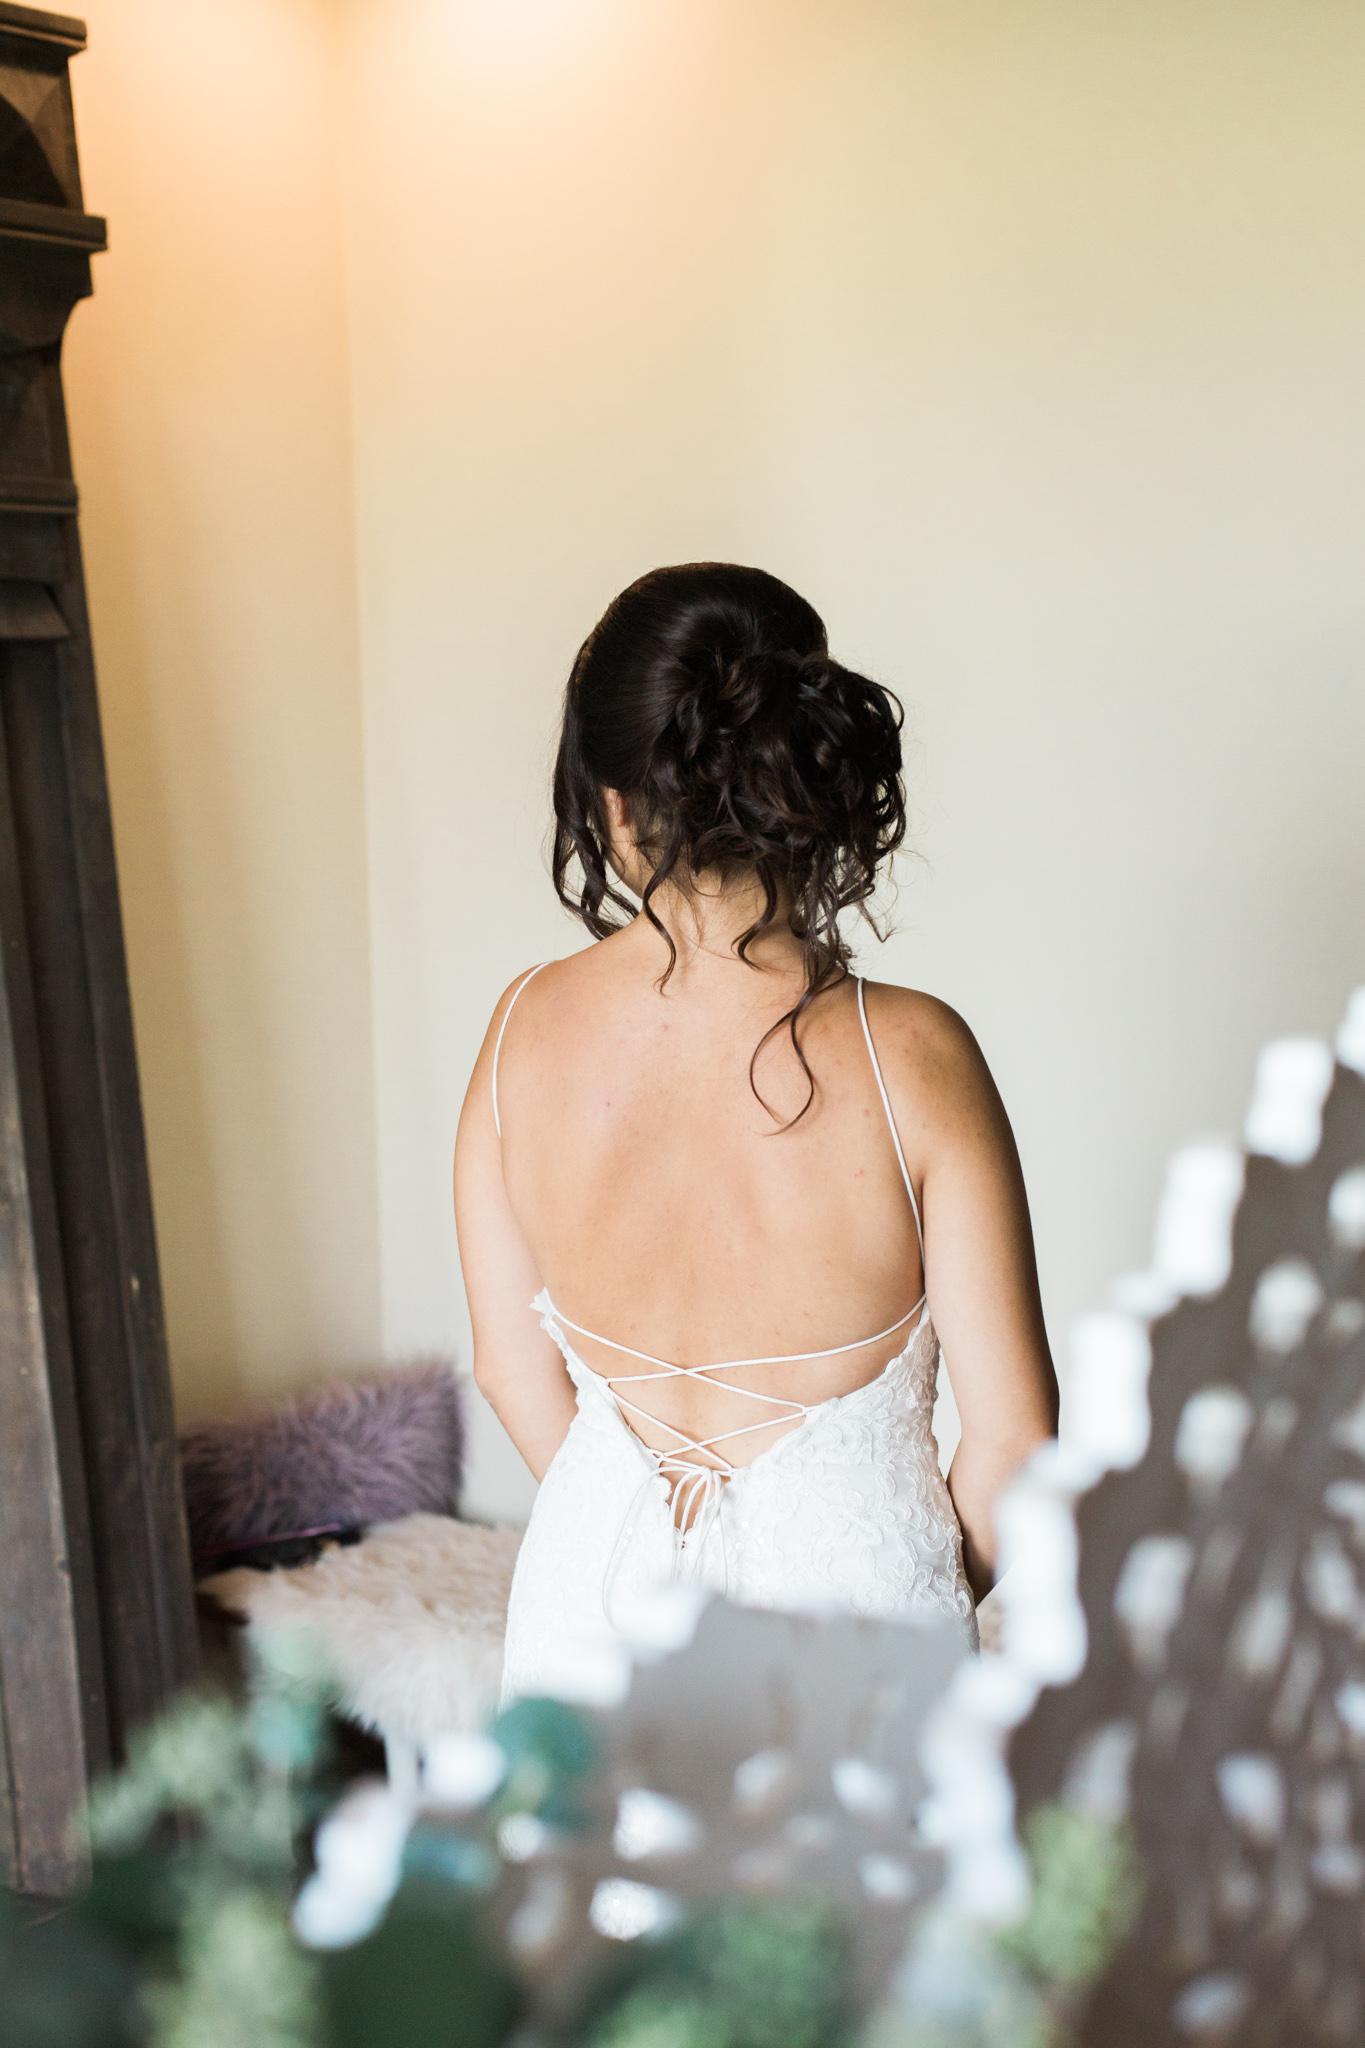 Olga_janni_wedding_090917_WEBSIZE (82 of 704).JPG